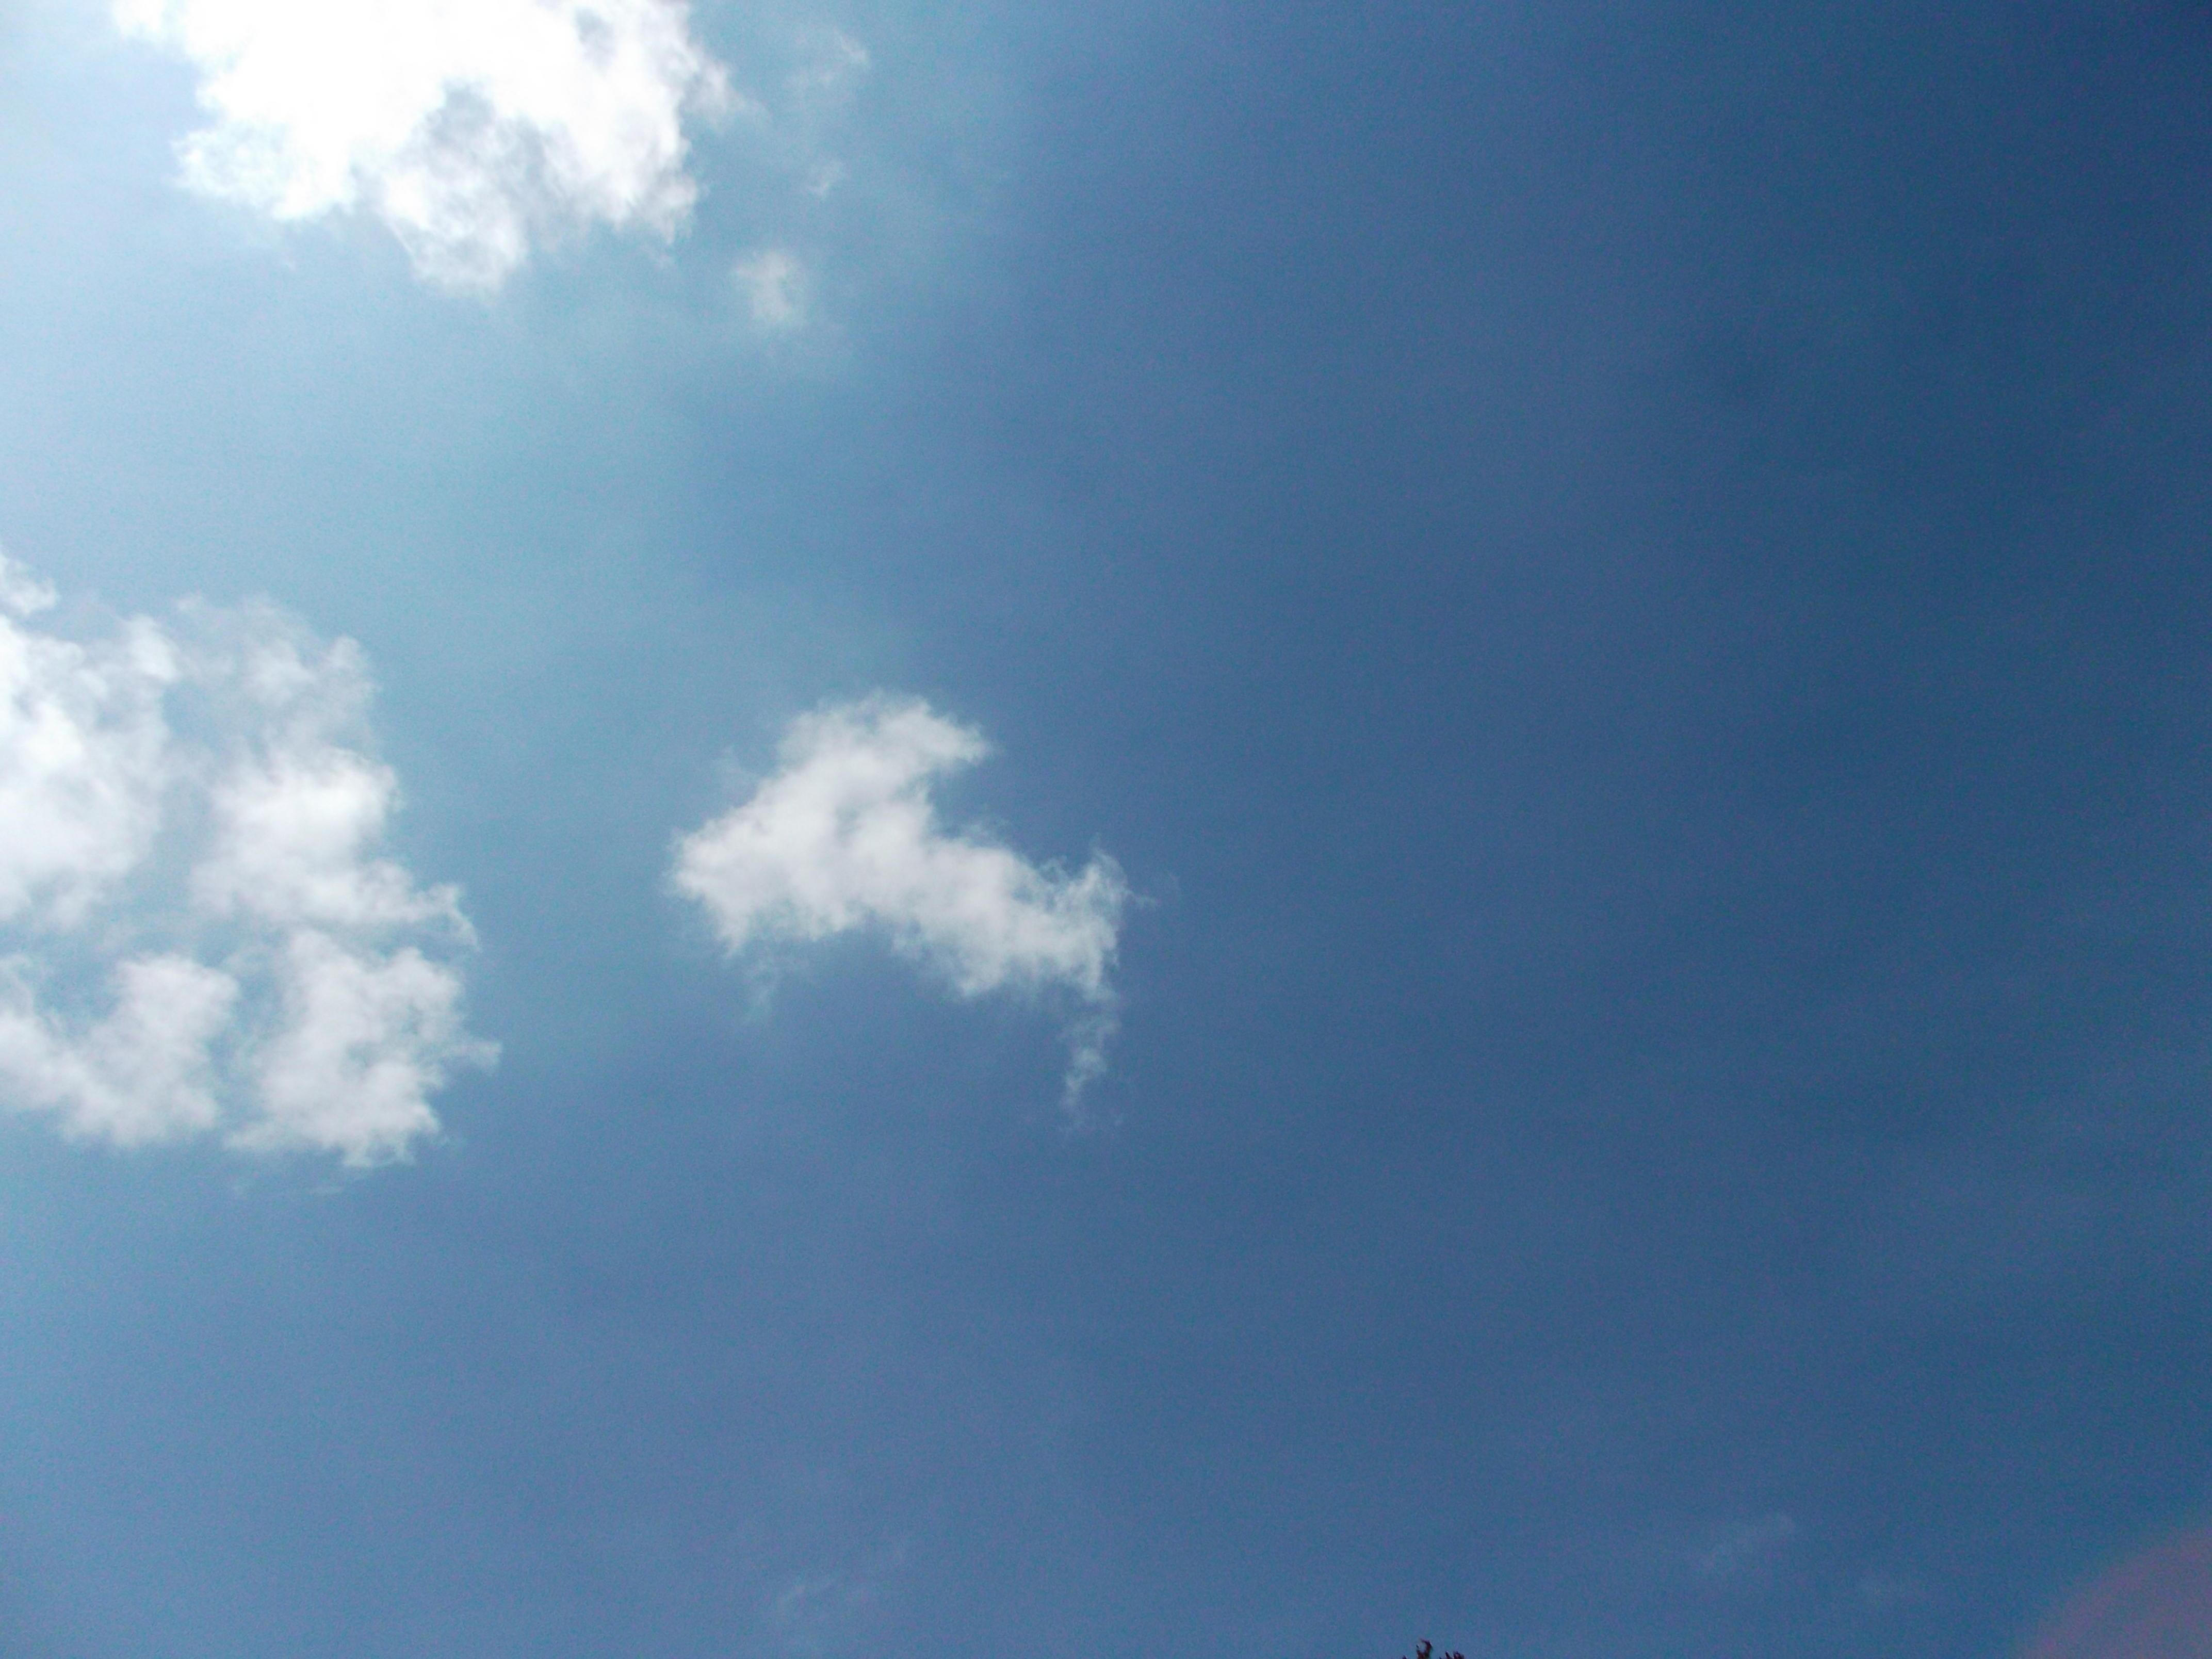 2013-05-18 Longitude -0.371 Latitude 49.182 Altitude 29 Heure 11h59